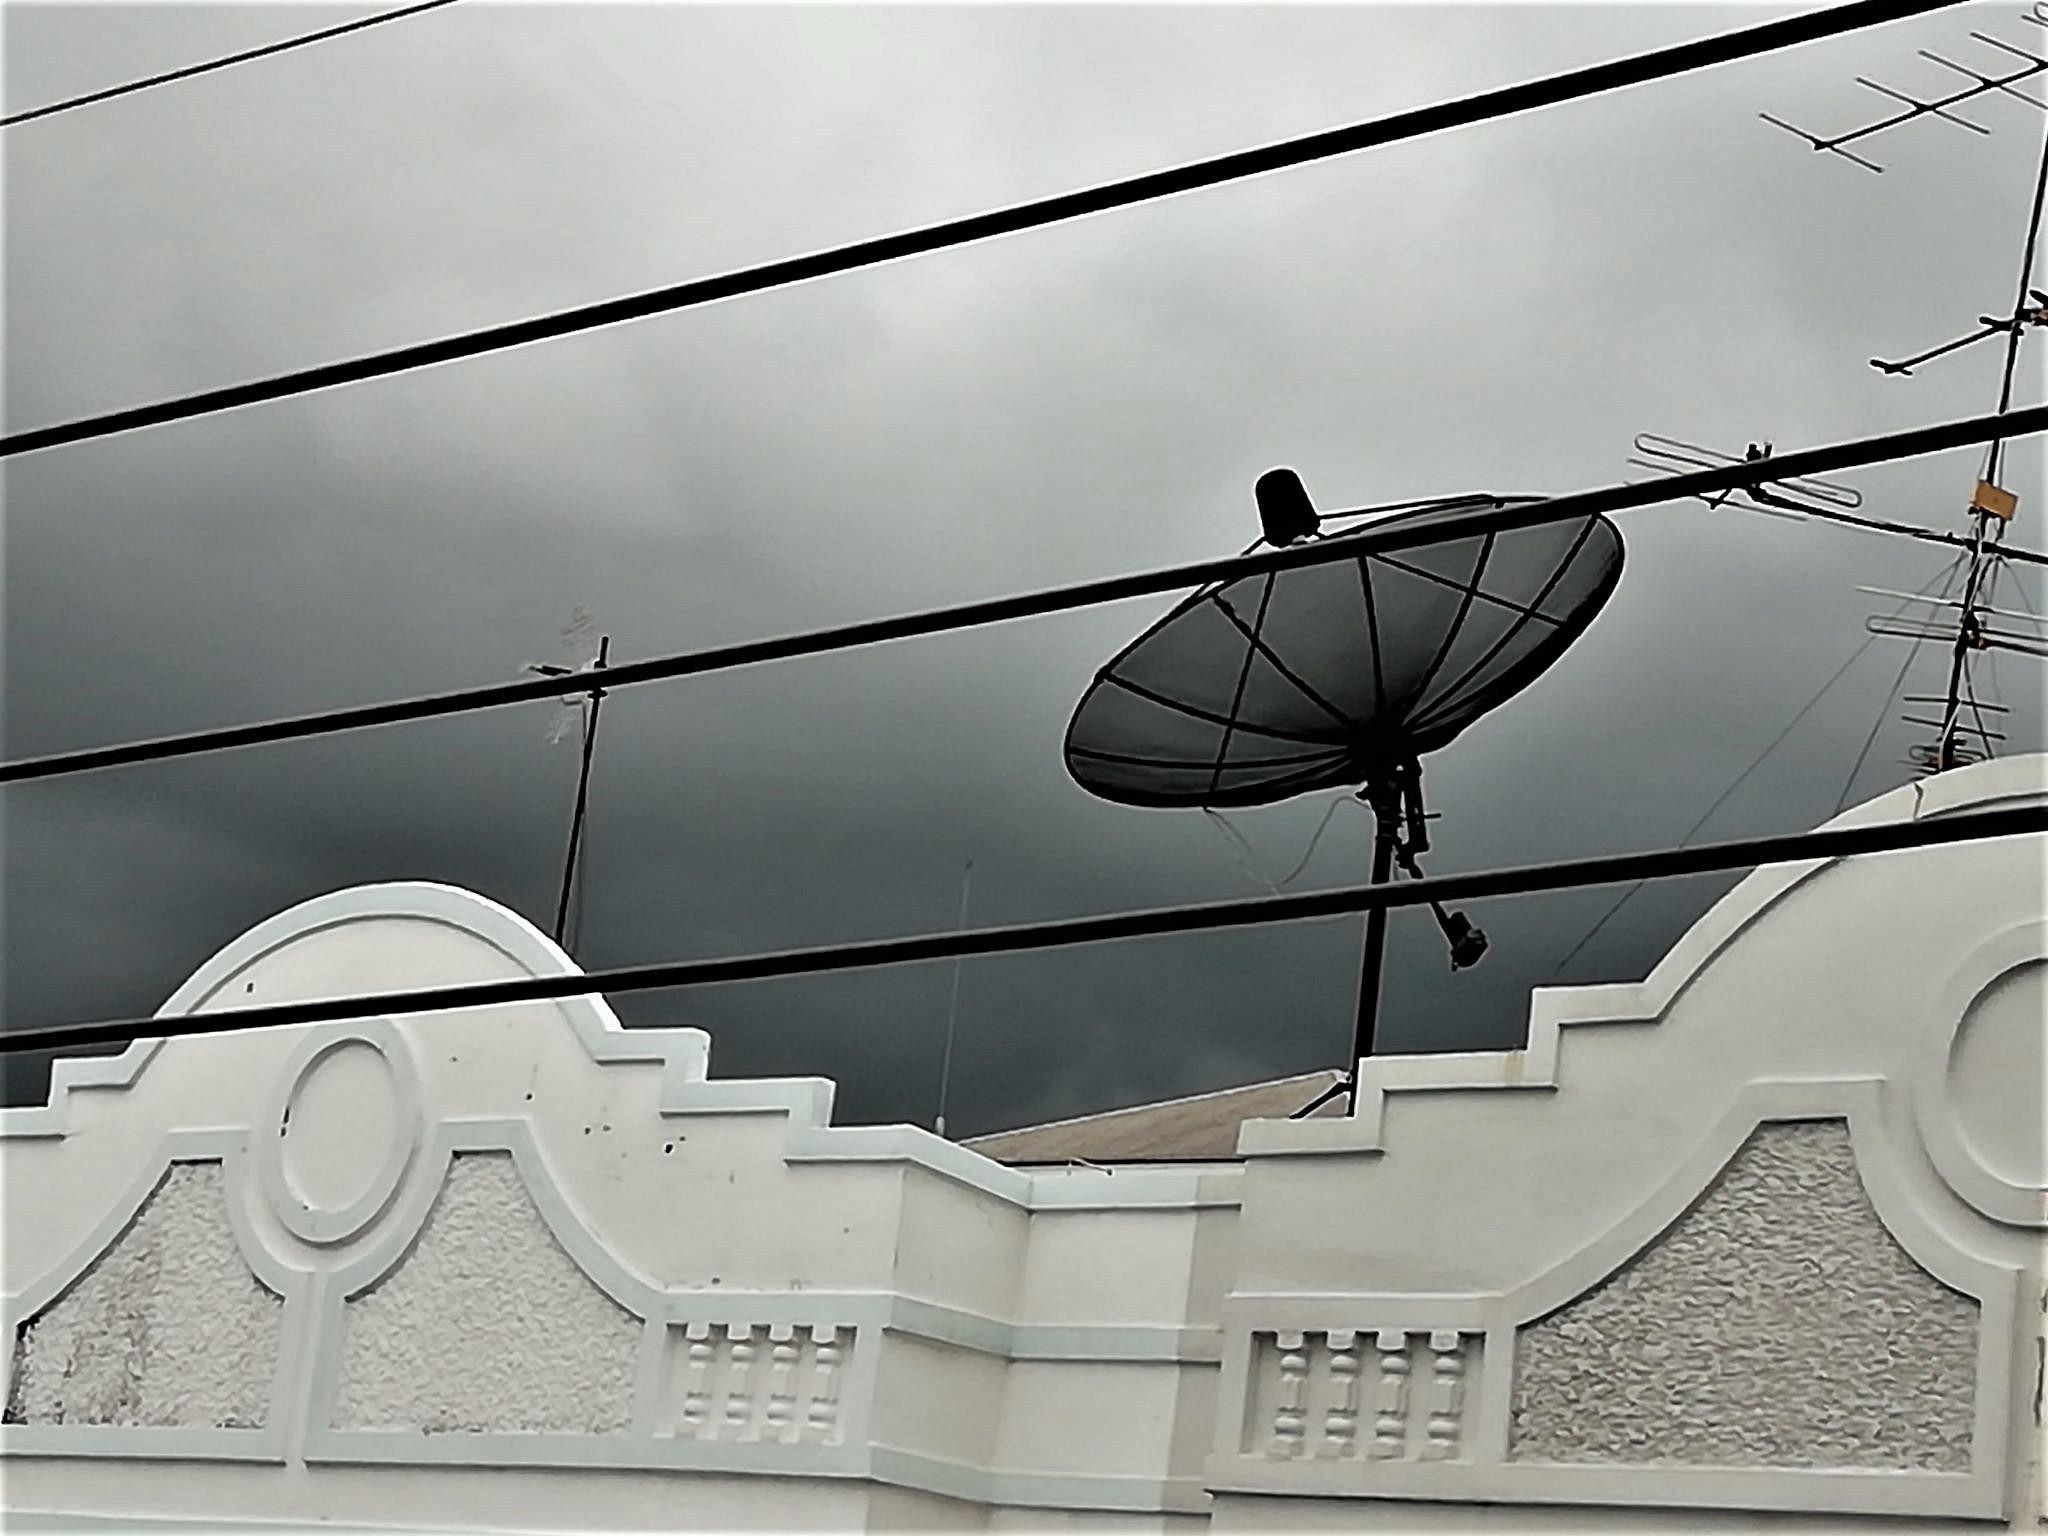 DARK CLOUDS CONTRAST WITH WHITE BUILDING ☁️🌧🏬🏢 ( เมฆดำ ตัดกับ ตึกขาว ☁️🧴🏬🏢 )